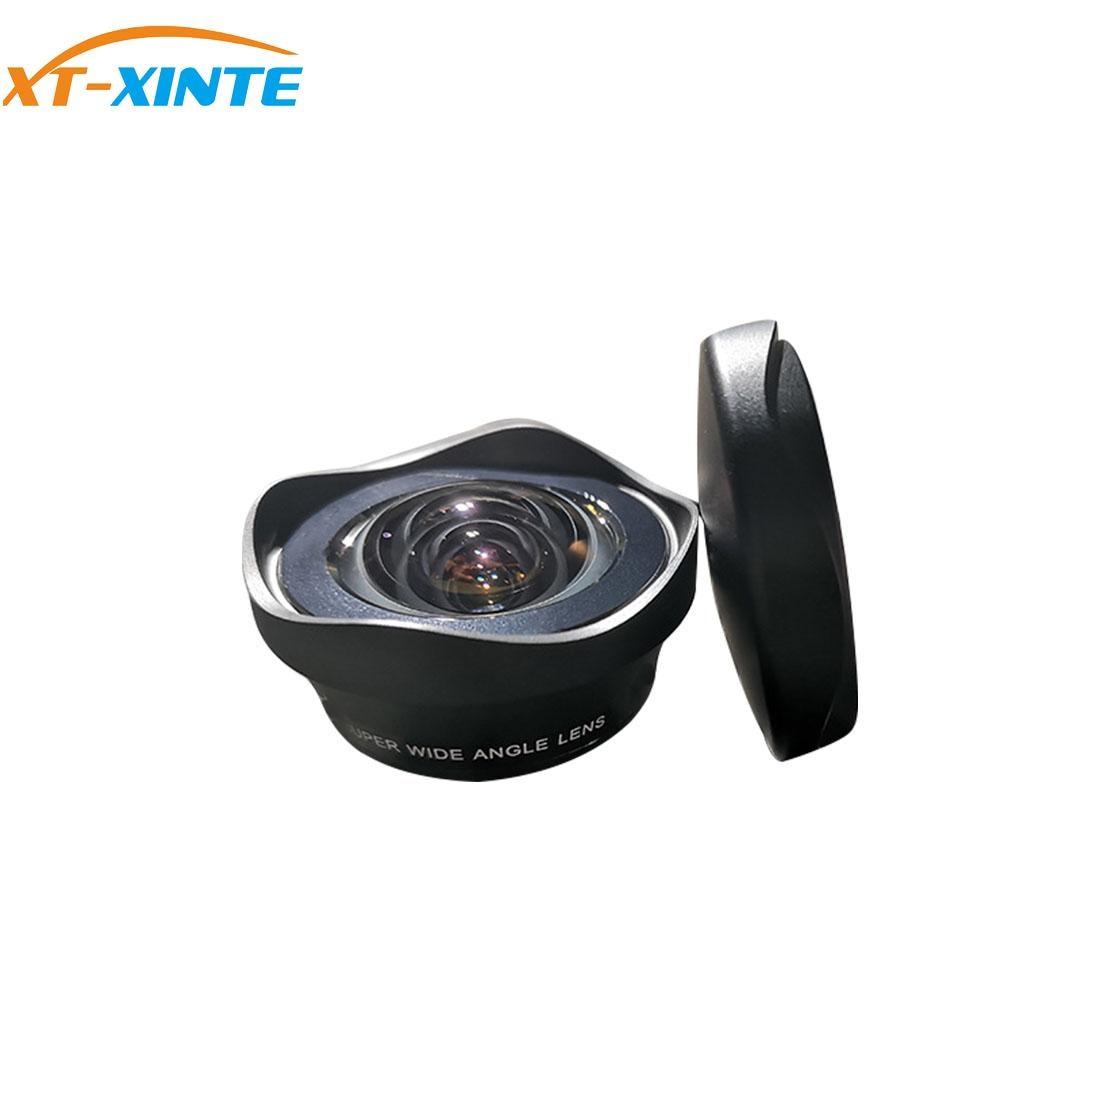 XT-XINTE الهاتف المحمول زاوية واسعة عدسة الخارجية 12 مللي متر شبه الكروي لا تشويه 120 درجة HD الهاتف المحمول التصوير الملحقات